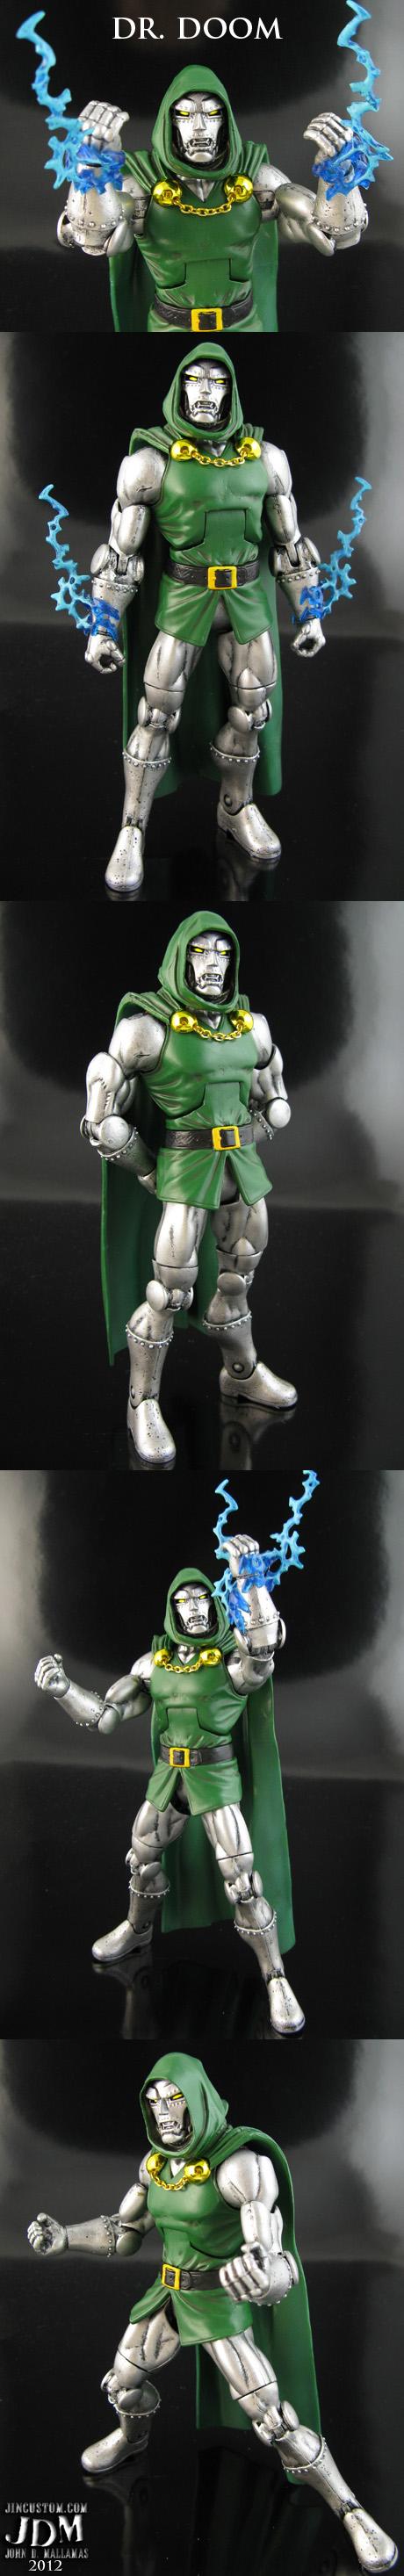 Dr Doom Custom Figure